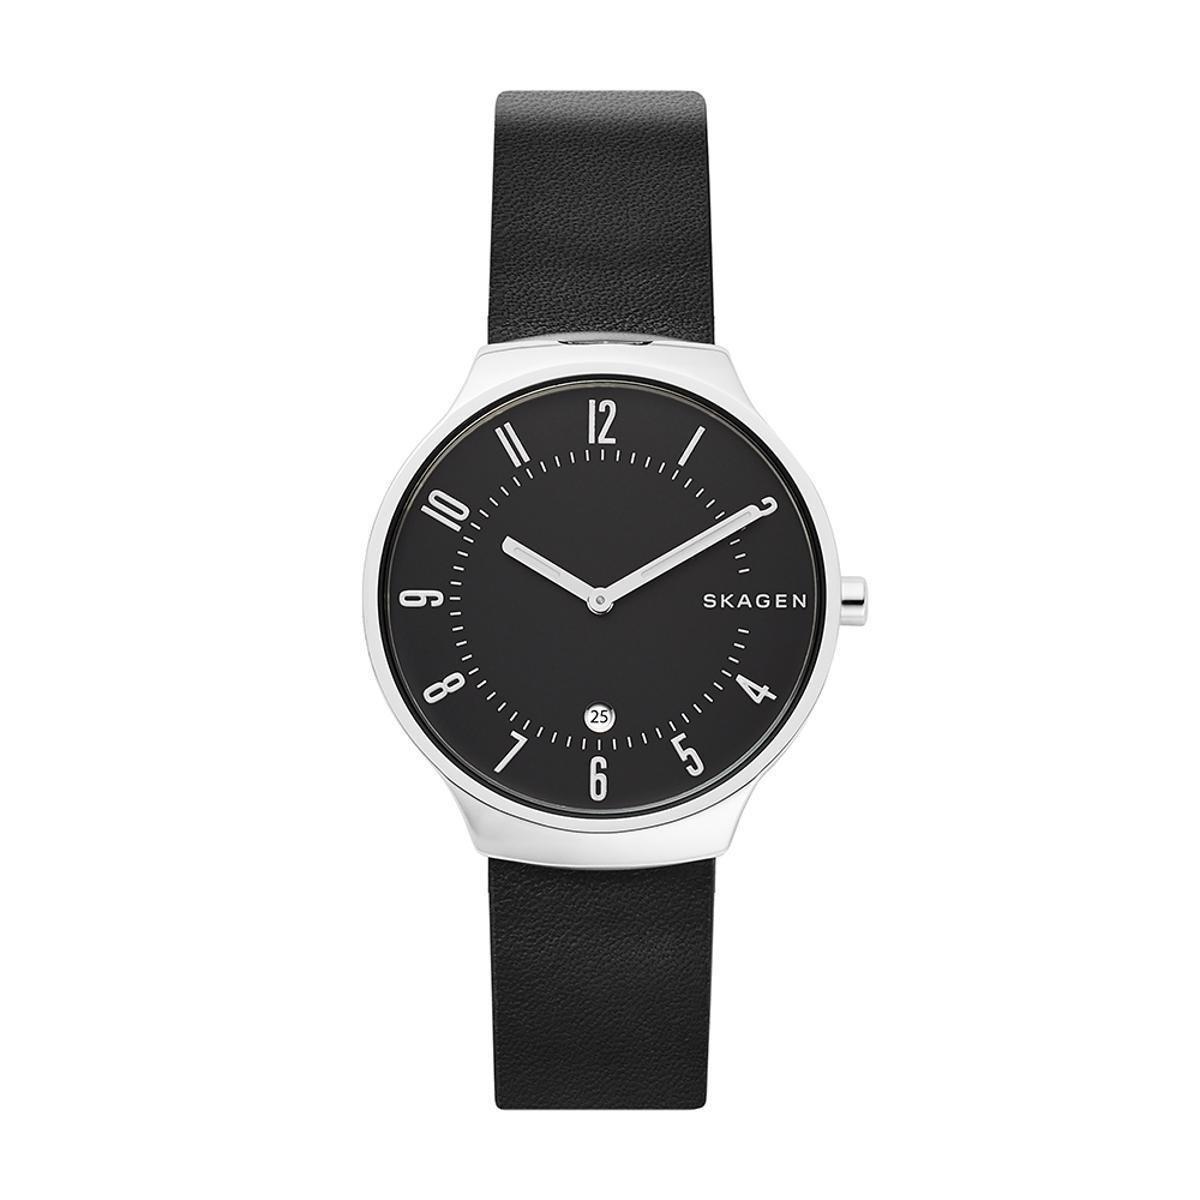 9ba18fe400c73 Relógio Skagen Masculino Grenen - SKW6459 0PN SKW6459 0PN - Preto - Compre  Agora